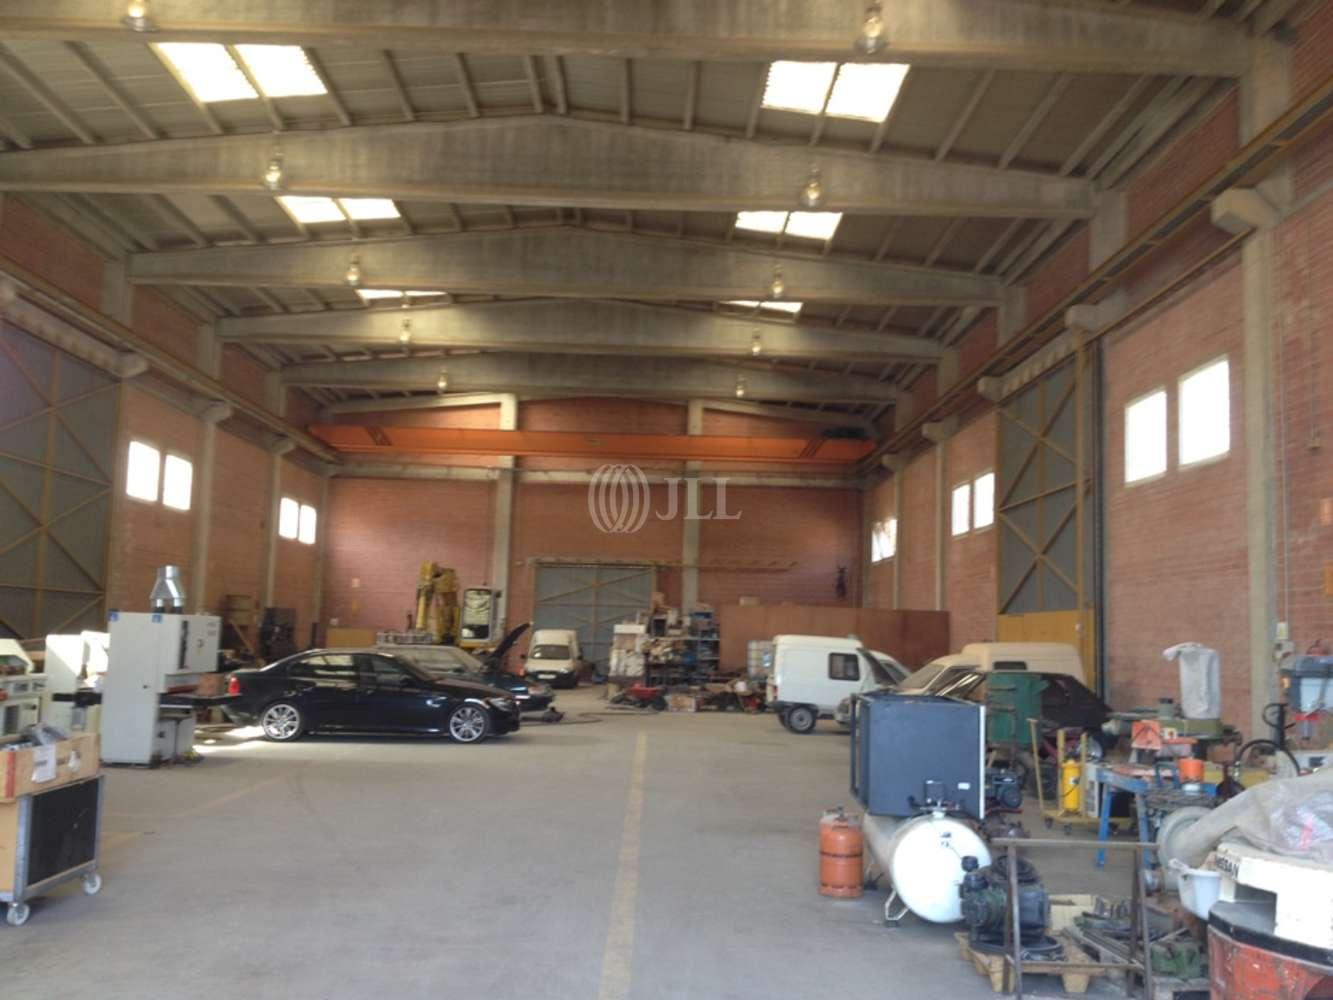 Naves industriales y logísticas Rubí, 08191 - Nave Industrial - B0262 PI CRTA MOLINS - 2788